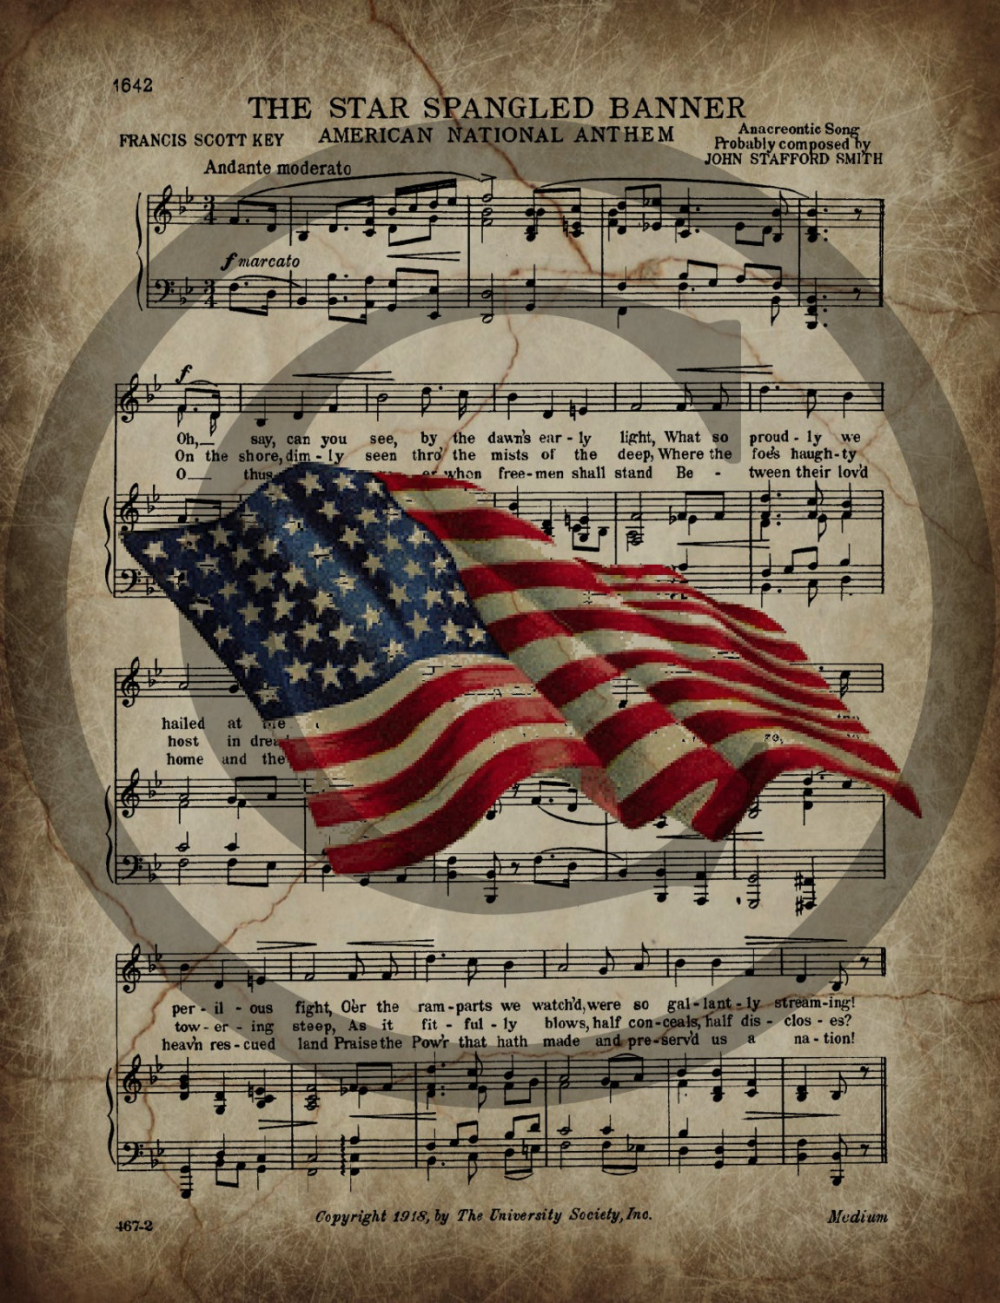 Primitive Patriotic Star Spangled Banner American Flag Jpeg Digital Image Feedsack Logo for Pillows Crock Can Pantry Labels Hang tags